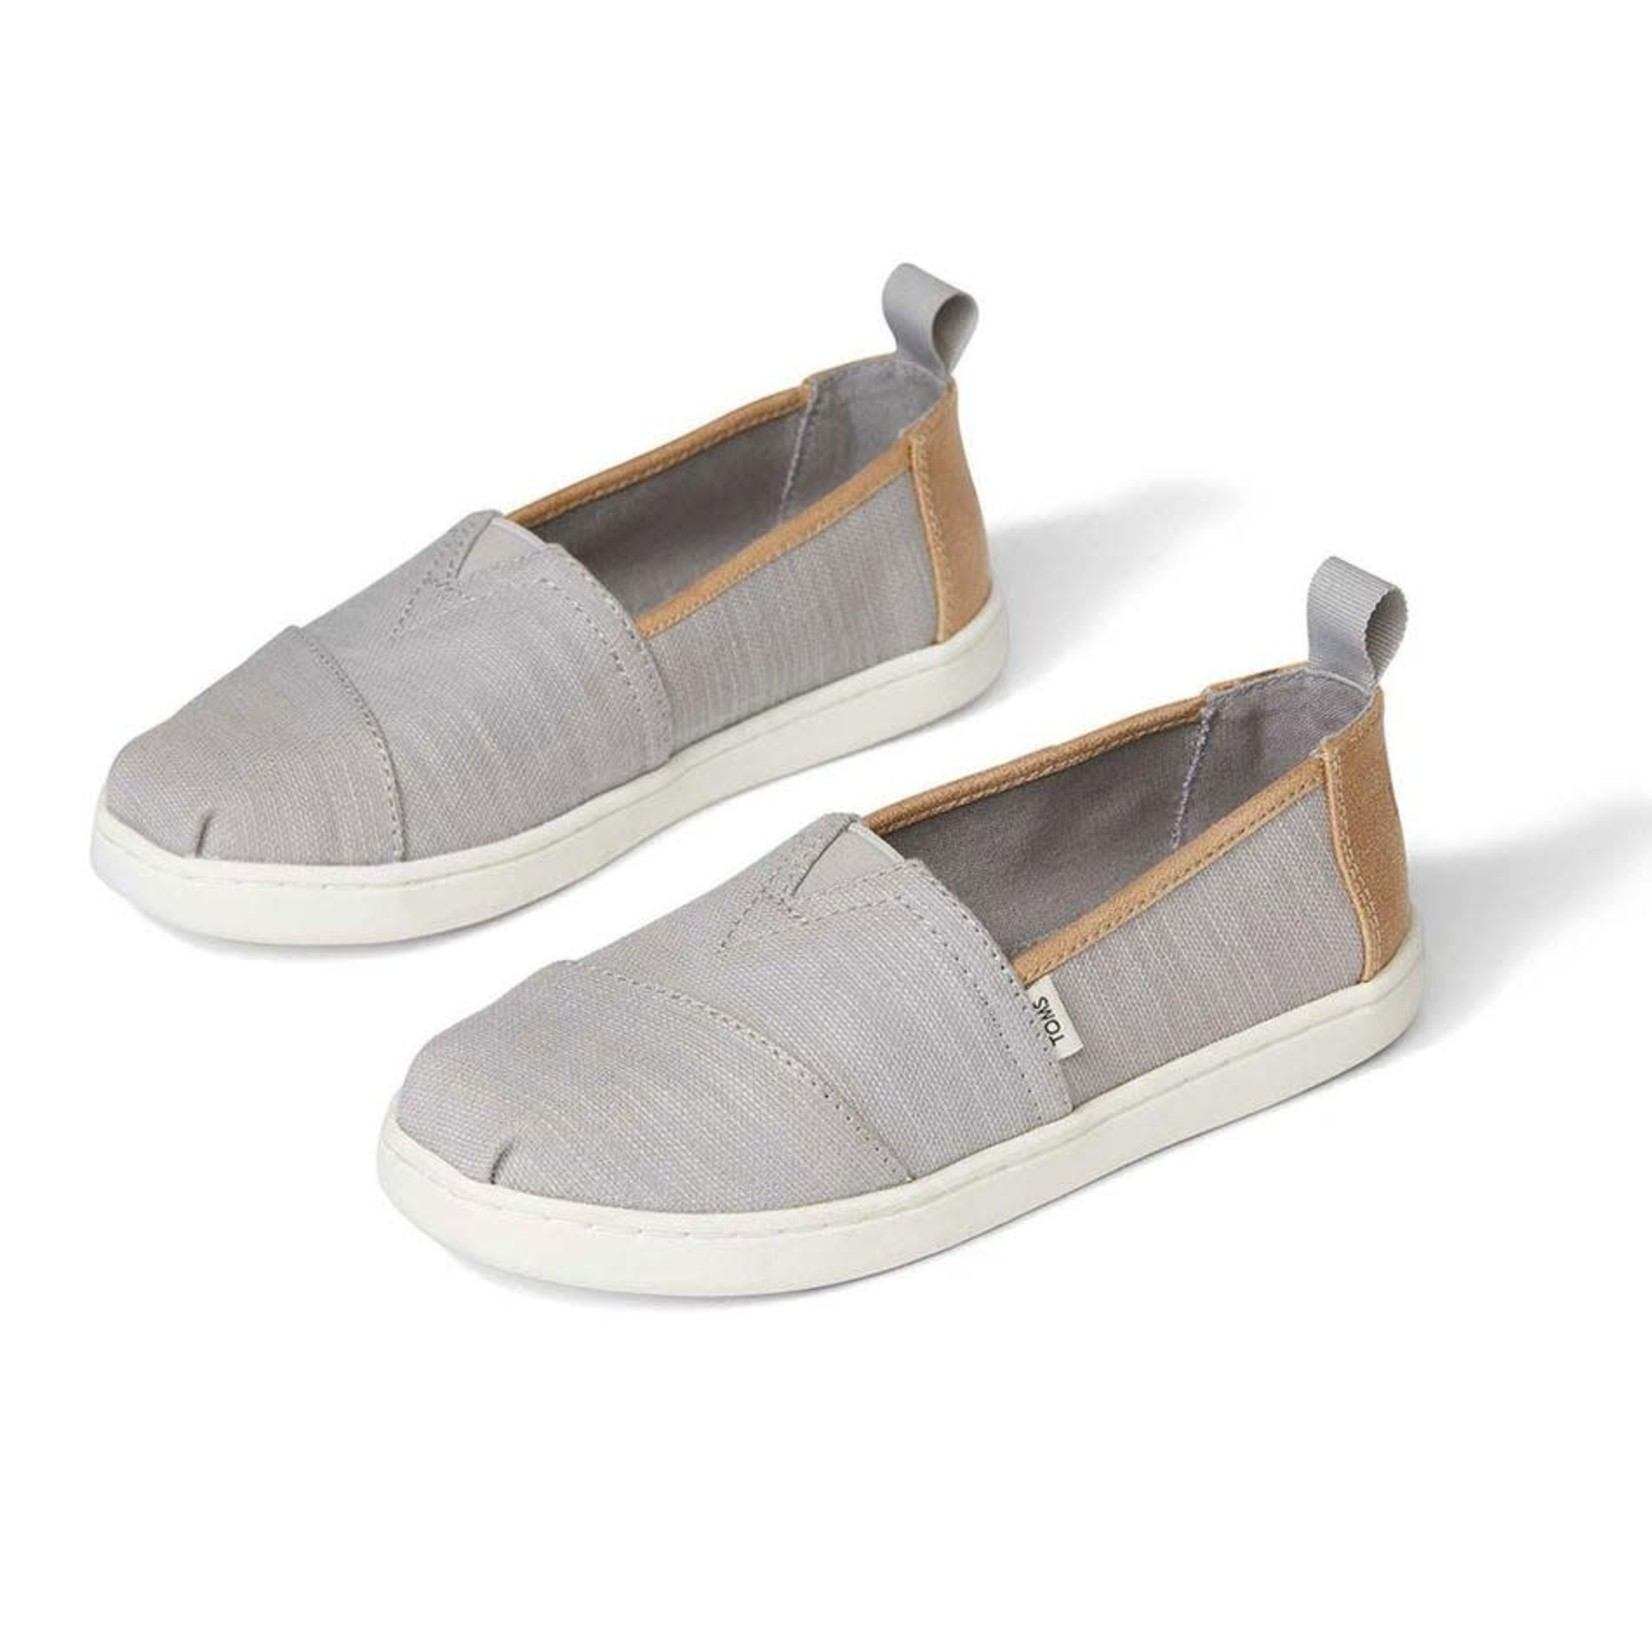 Toms Toms Casual Shoes, Alpargata, Girls